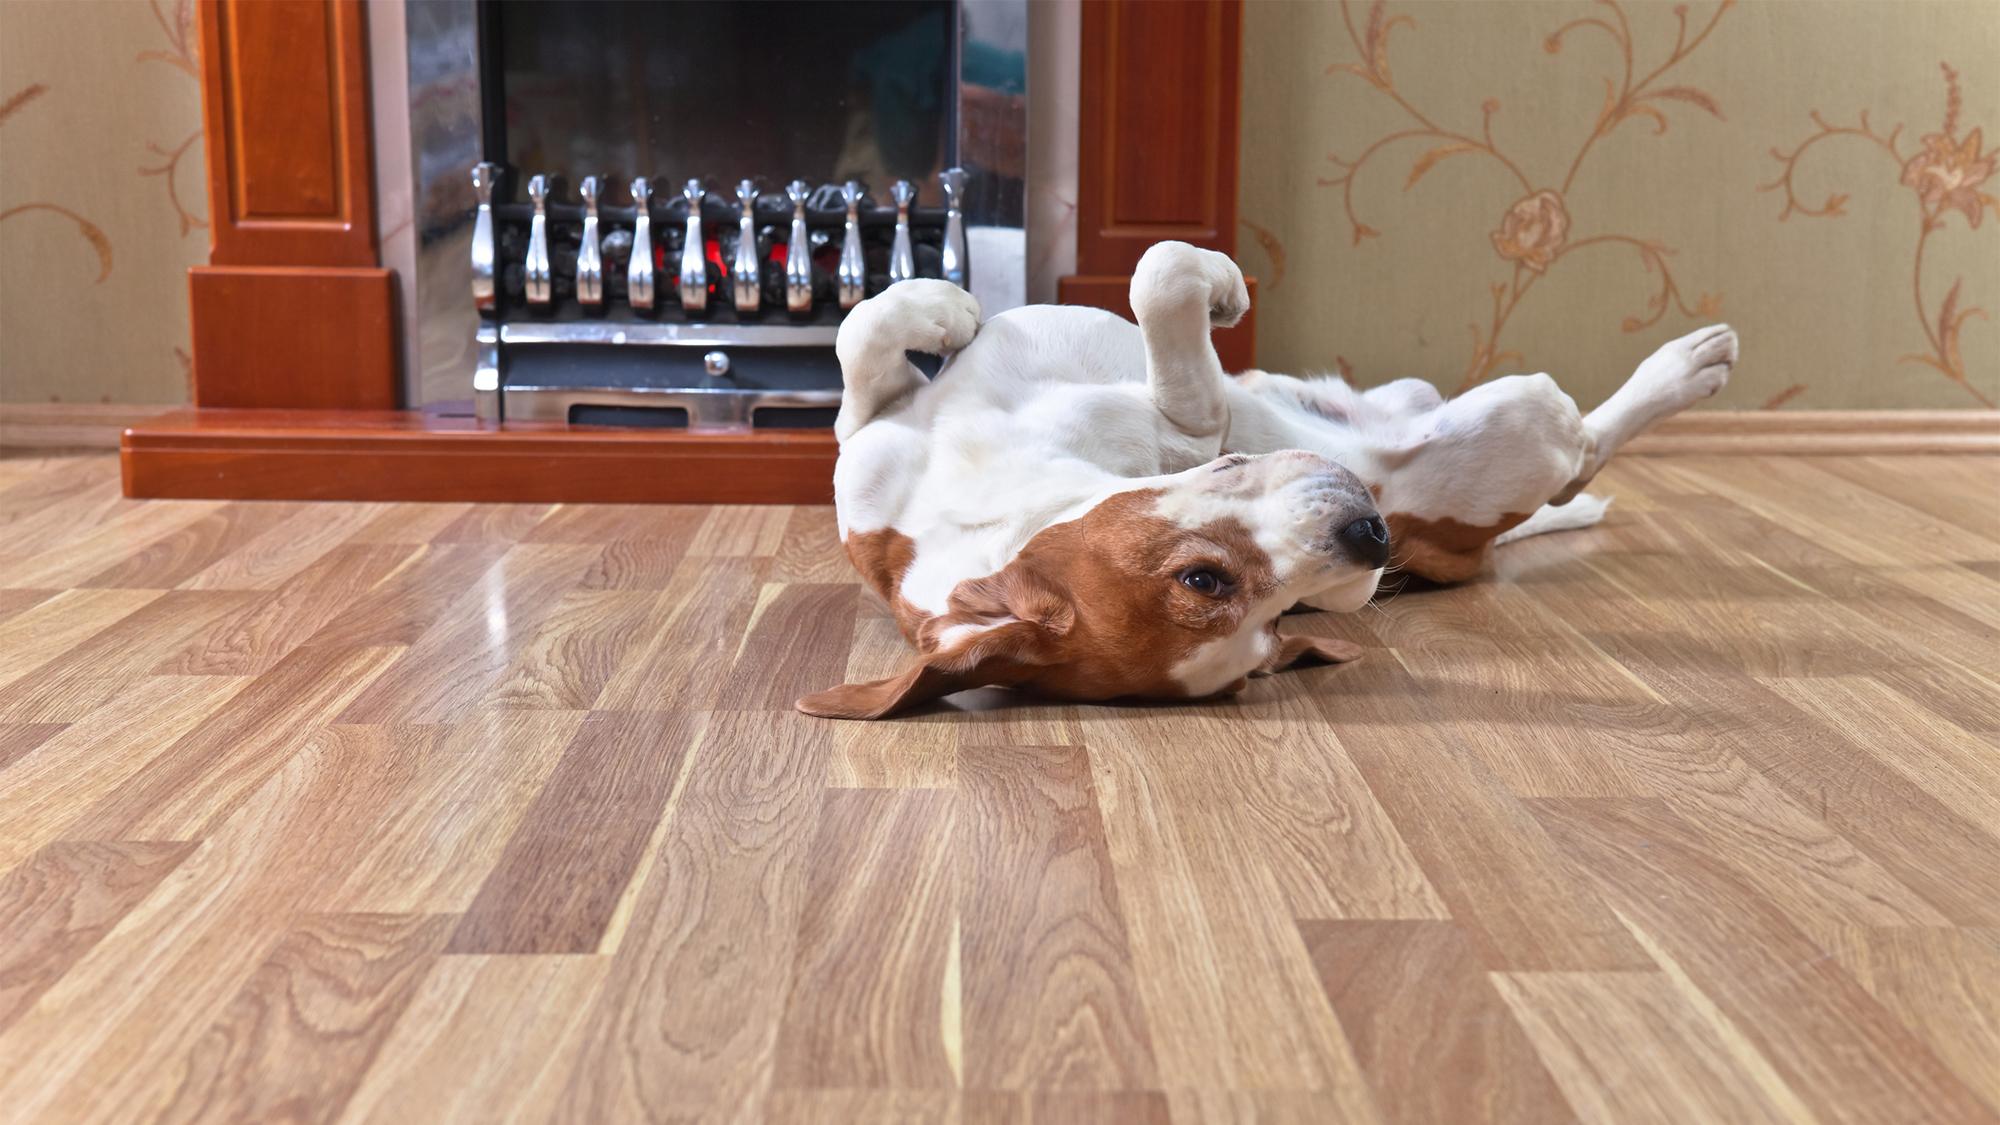 S To Fix Squeaky Floors Through Carpet Carpet Vidalondon